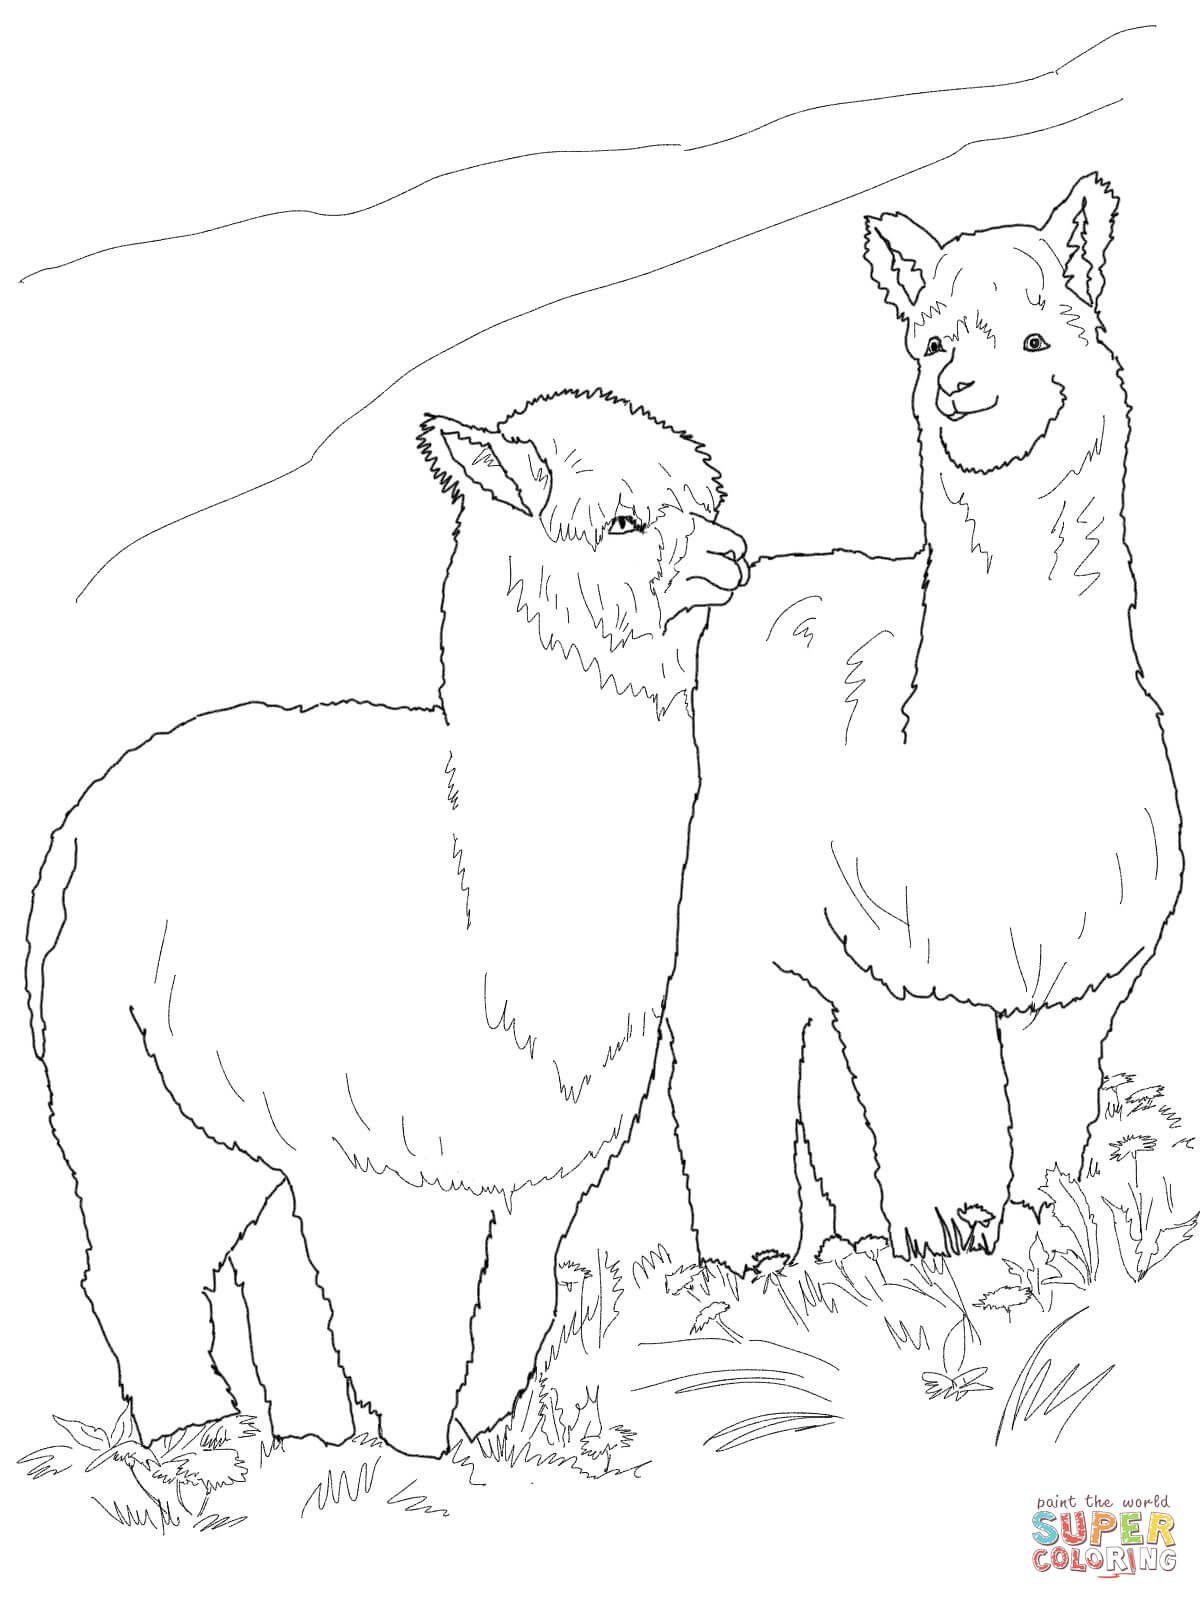 Two Hairy Alpacas Super Coloring Ausmalbilder Alpaka Ausmalen